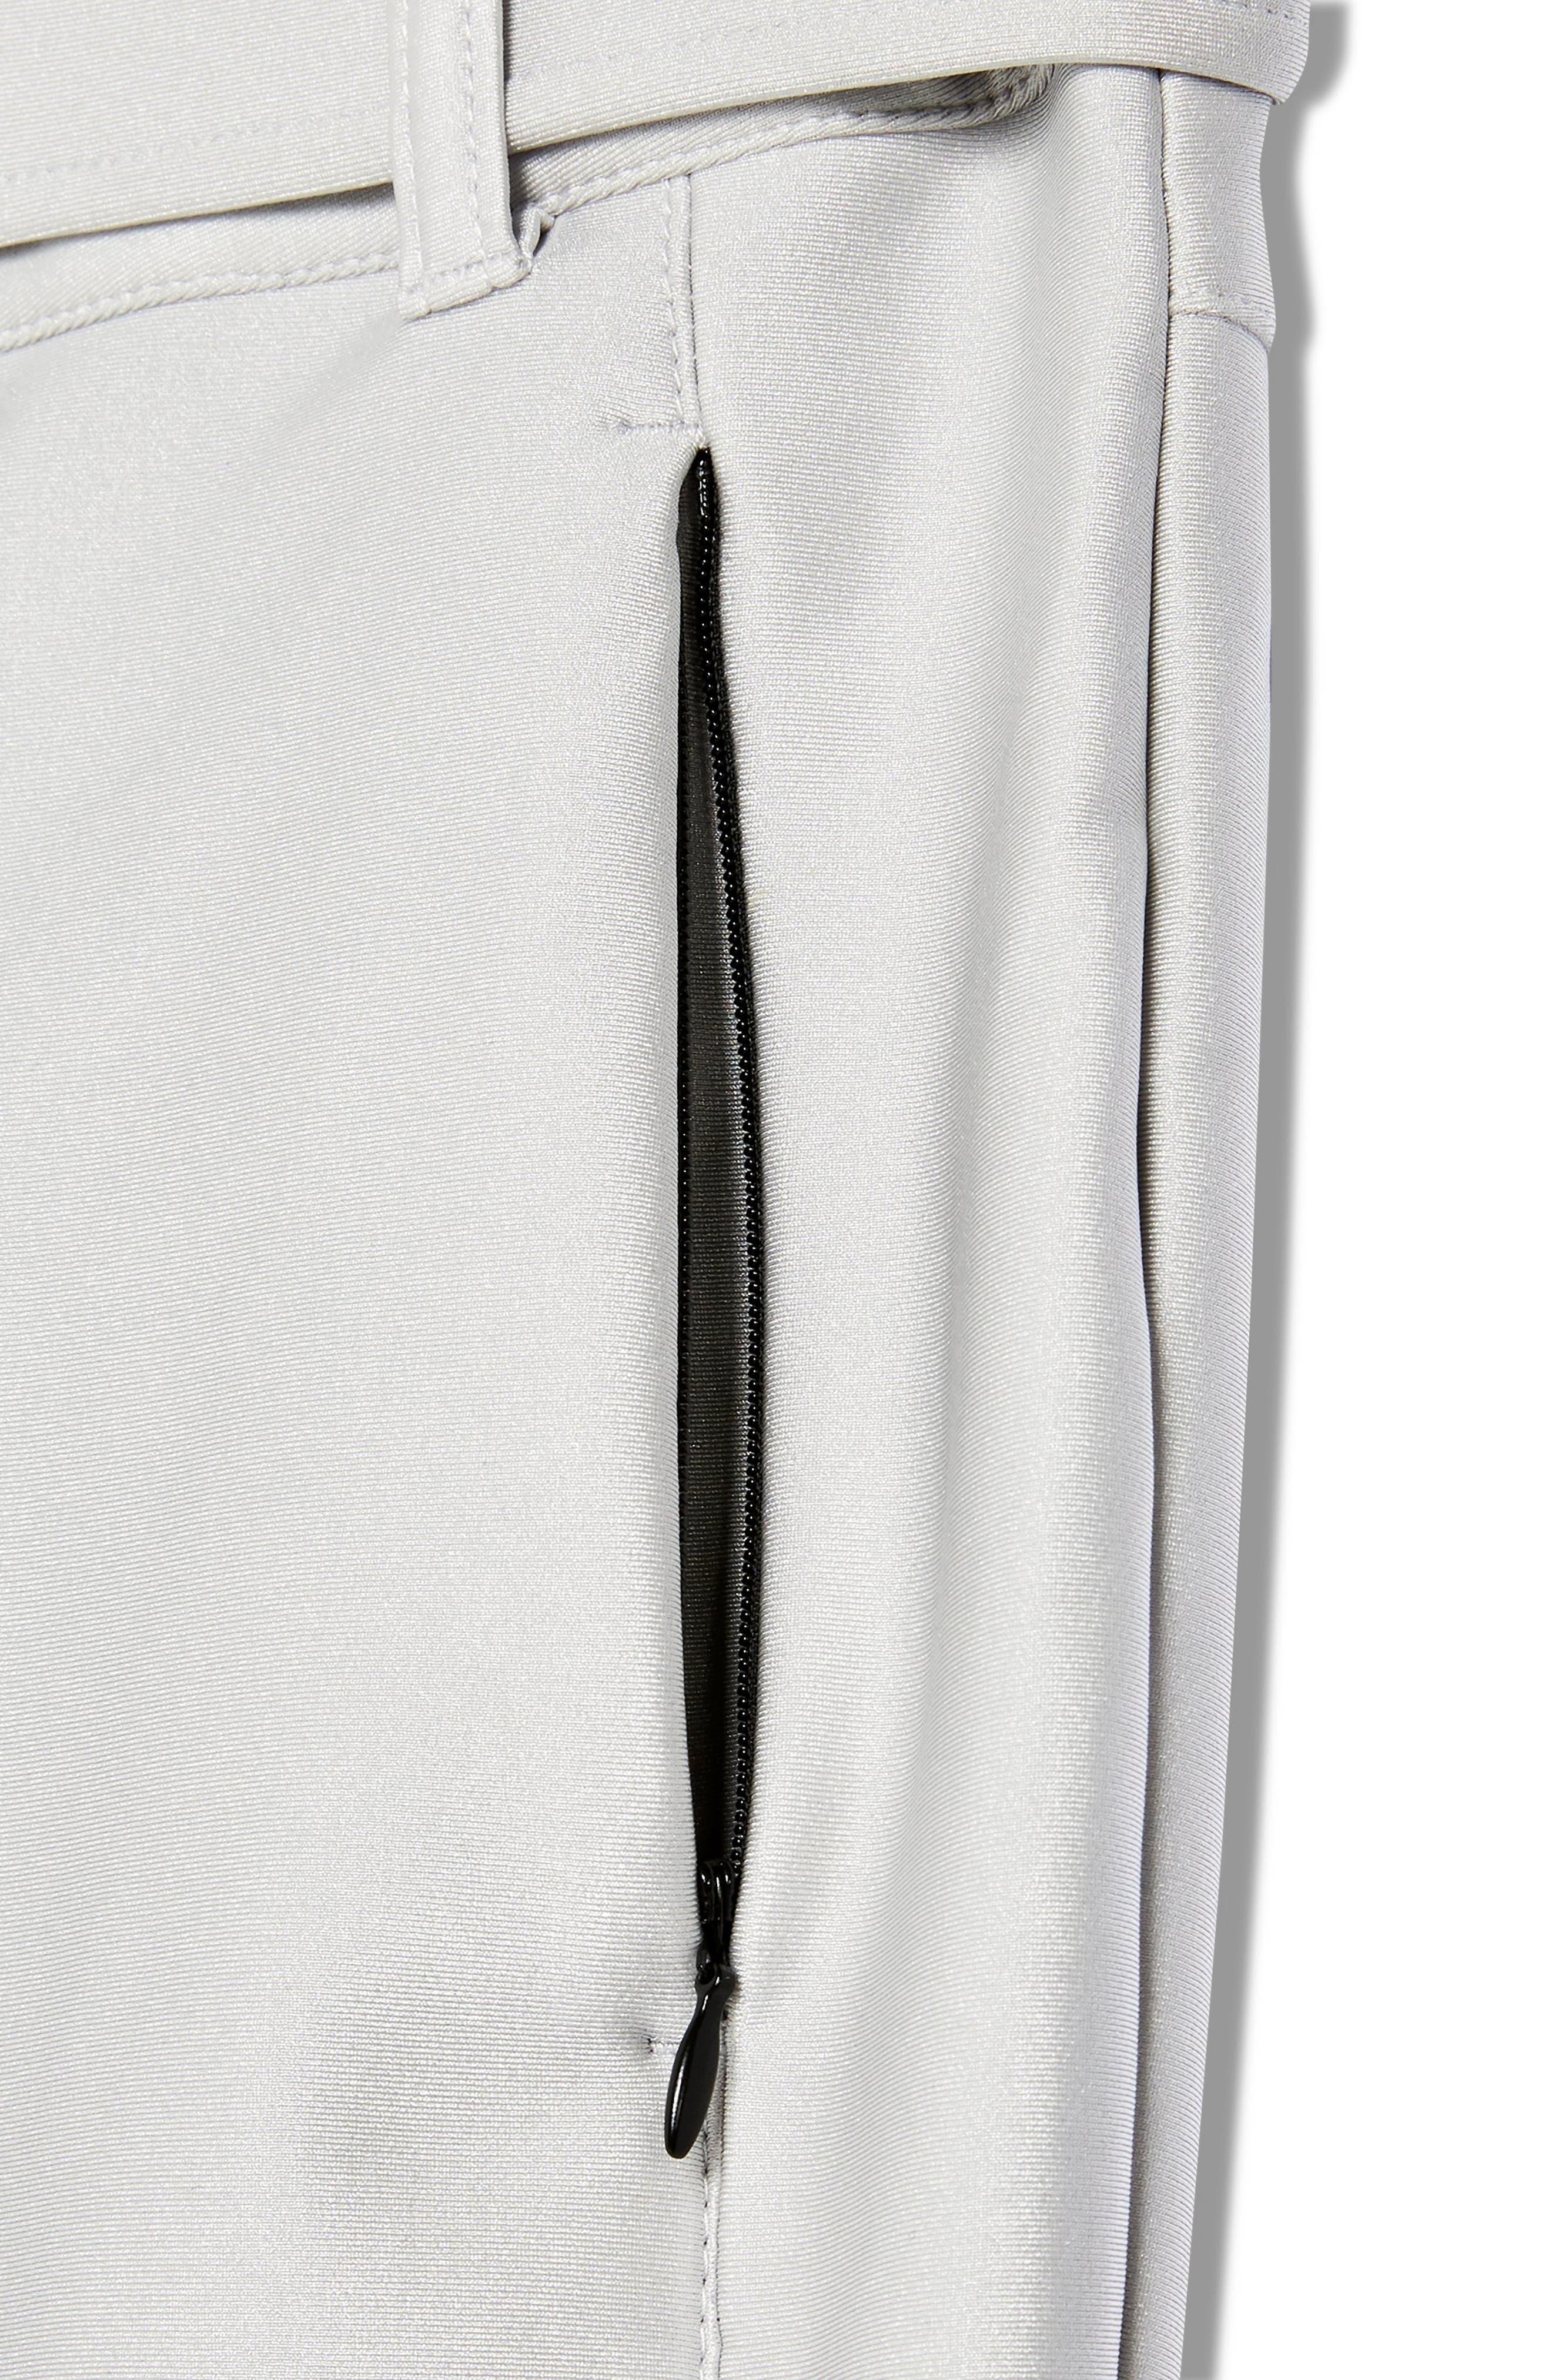 Sno Metallic Alanis Trousers,                             Alternate thumbnail 4, color,                             SILVER MULTI